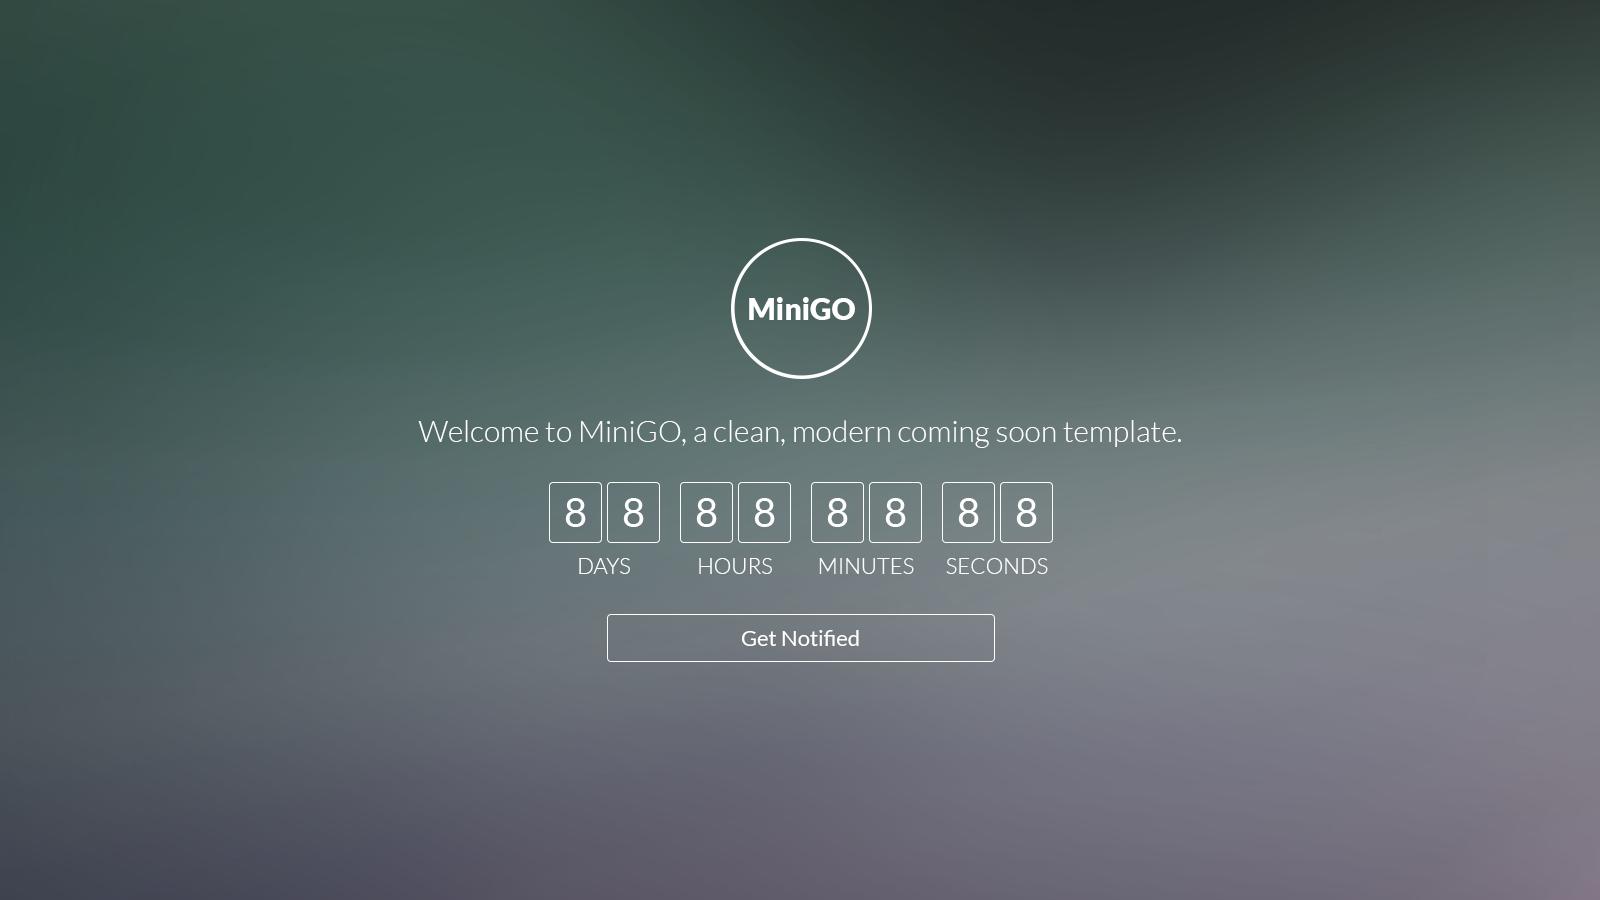 Minigo Uber Minimal Flat Coming Soon Page